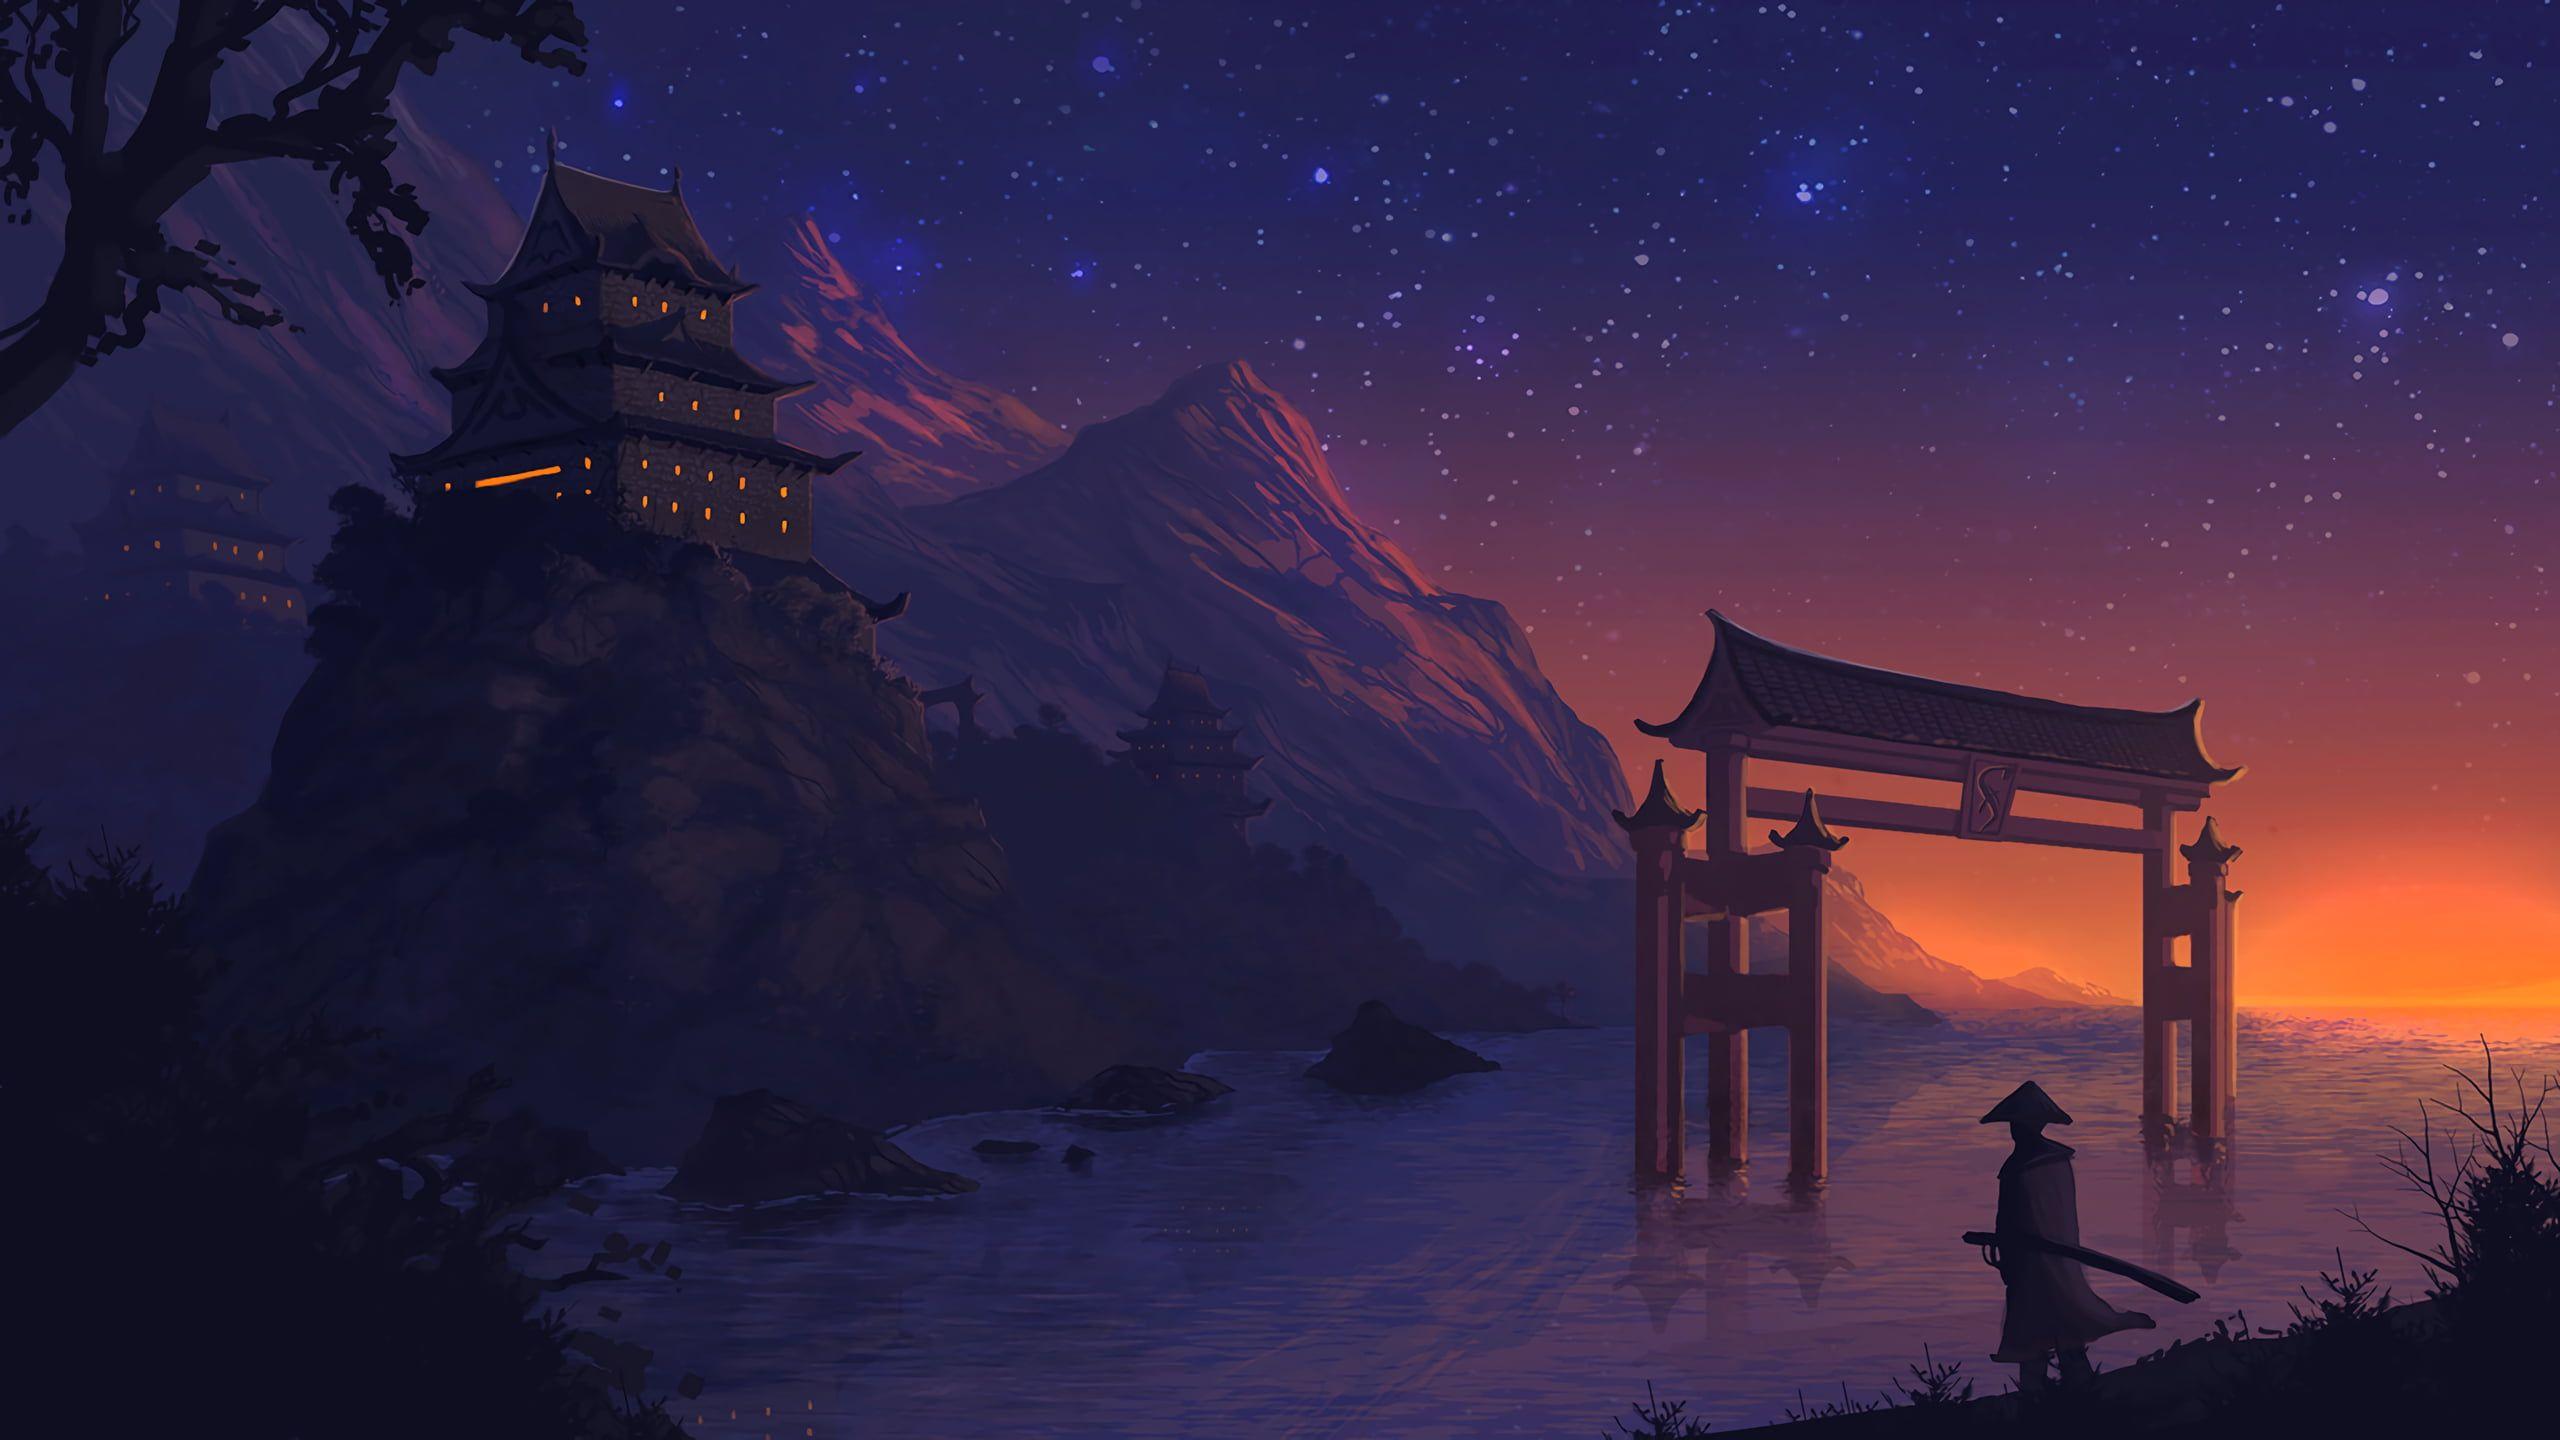 Hd Wallpaper Man Near Torii Gate Wallpaper Gray Temple Wallpaper Hd Landscape Samurai Wallpaper Landscape Wallpaper 10 wallpaper anime samurai